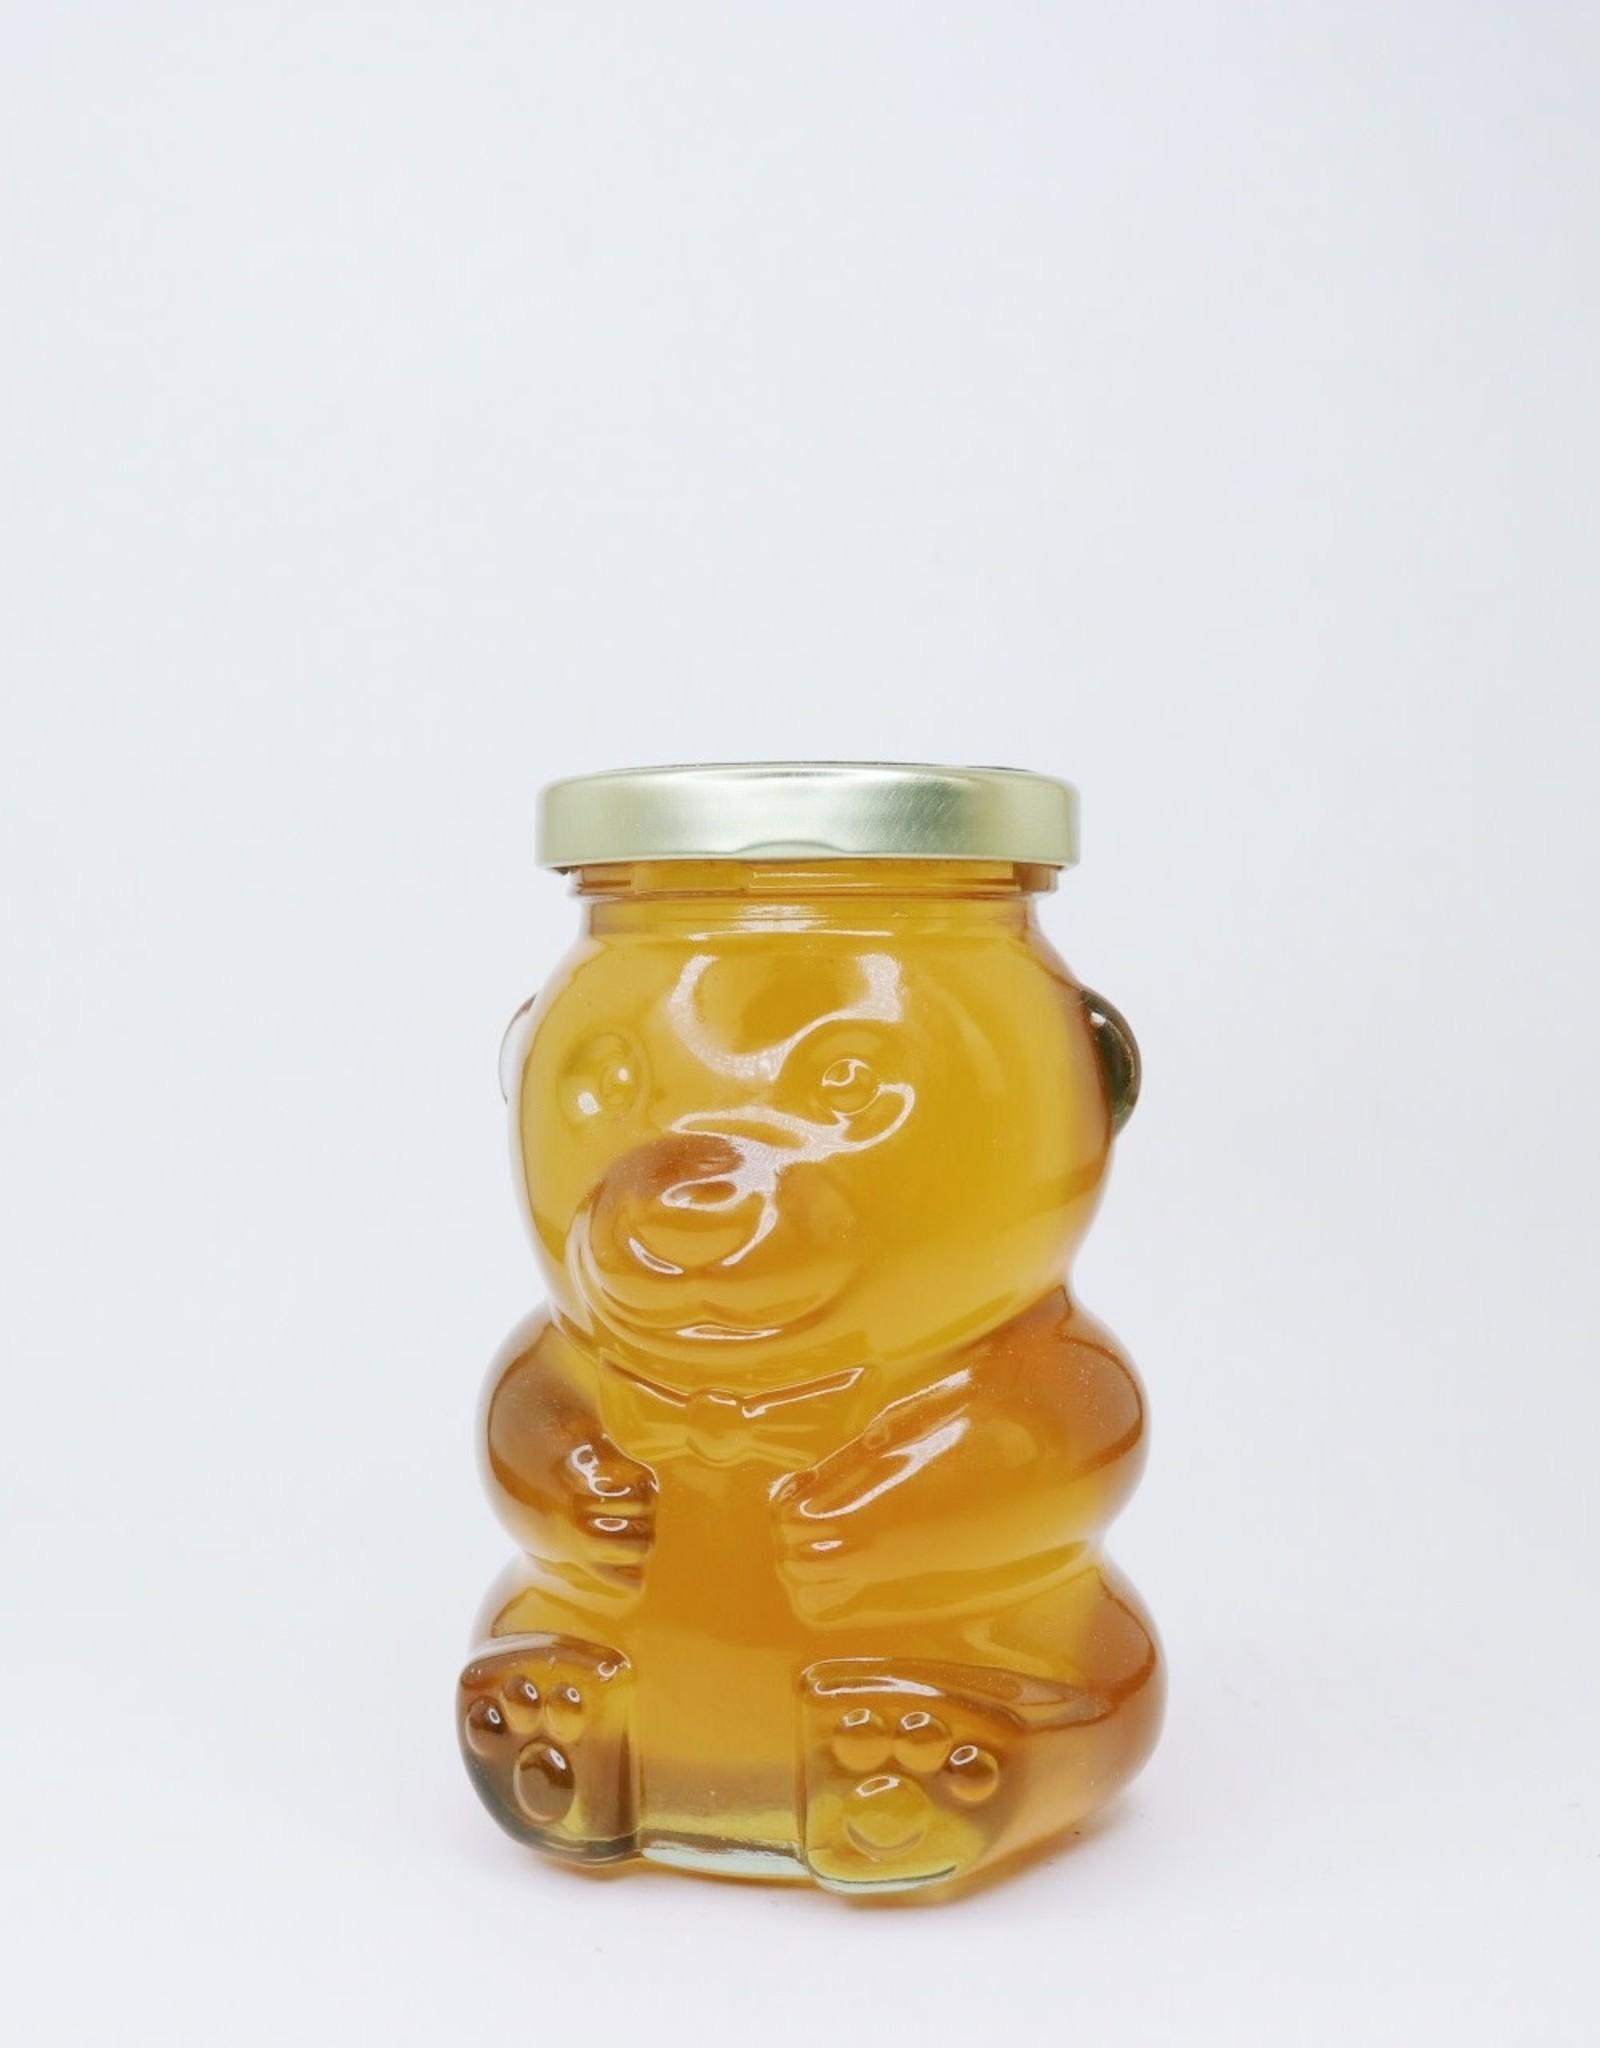 Honey & the Hive Wildflower Bow-tie Bear 13.5 oz.